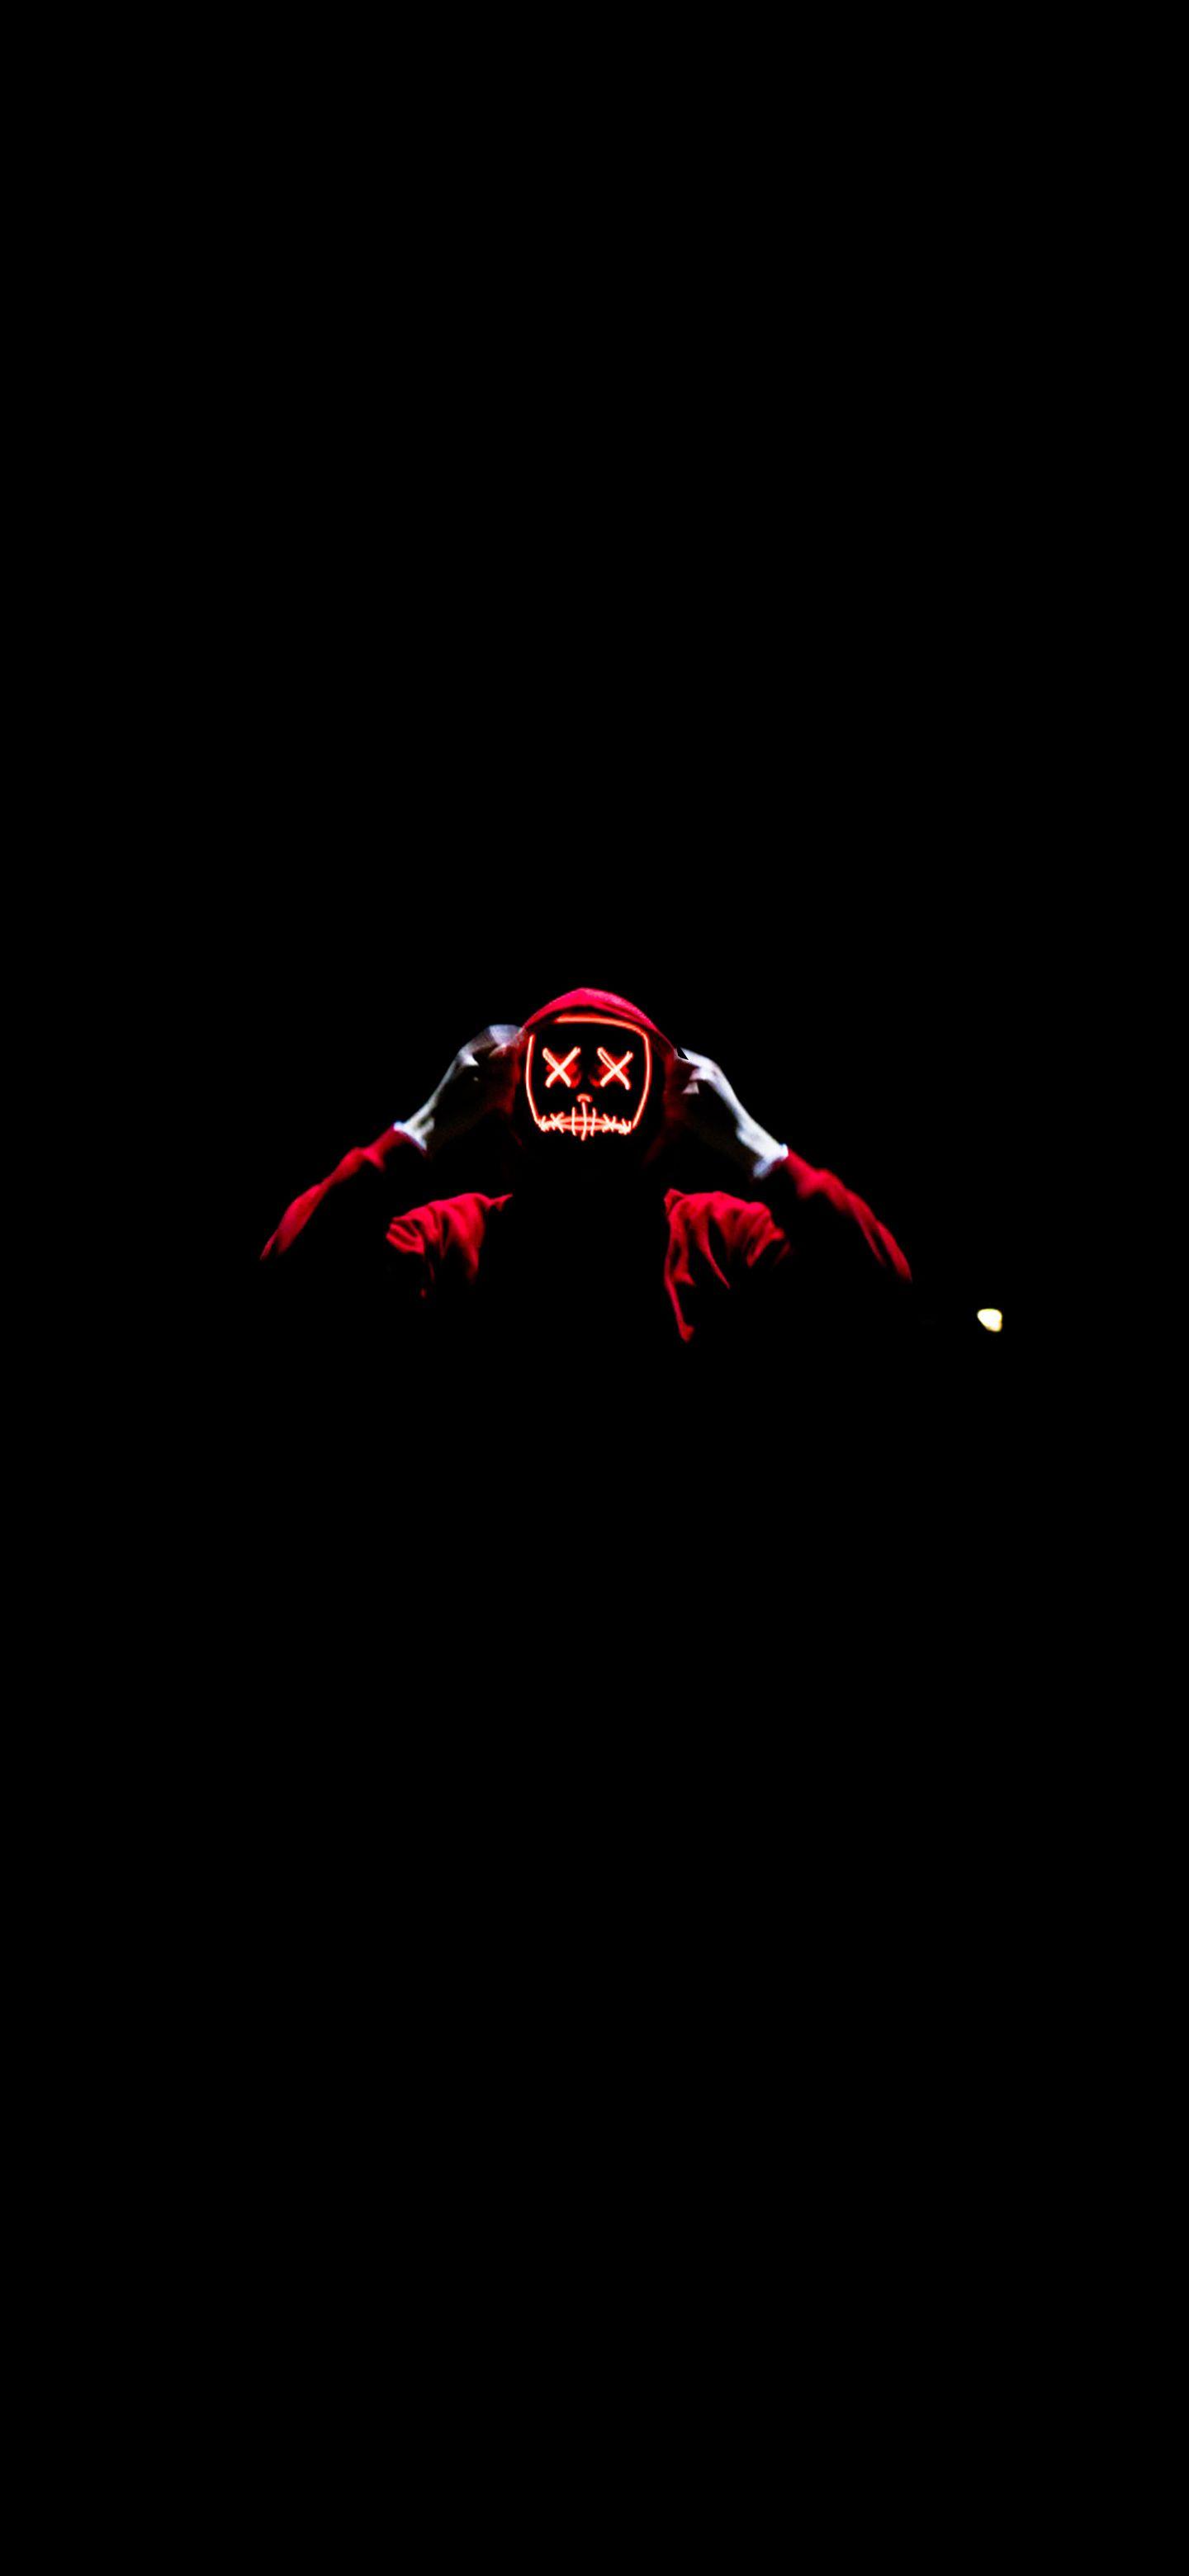 Guy With Illuminated Neon Mask Neon Wallpaper Black Wallpaper Dark Wallpaper